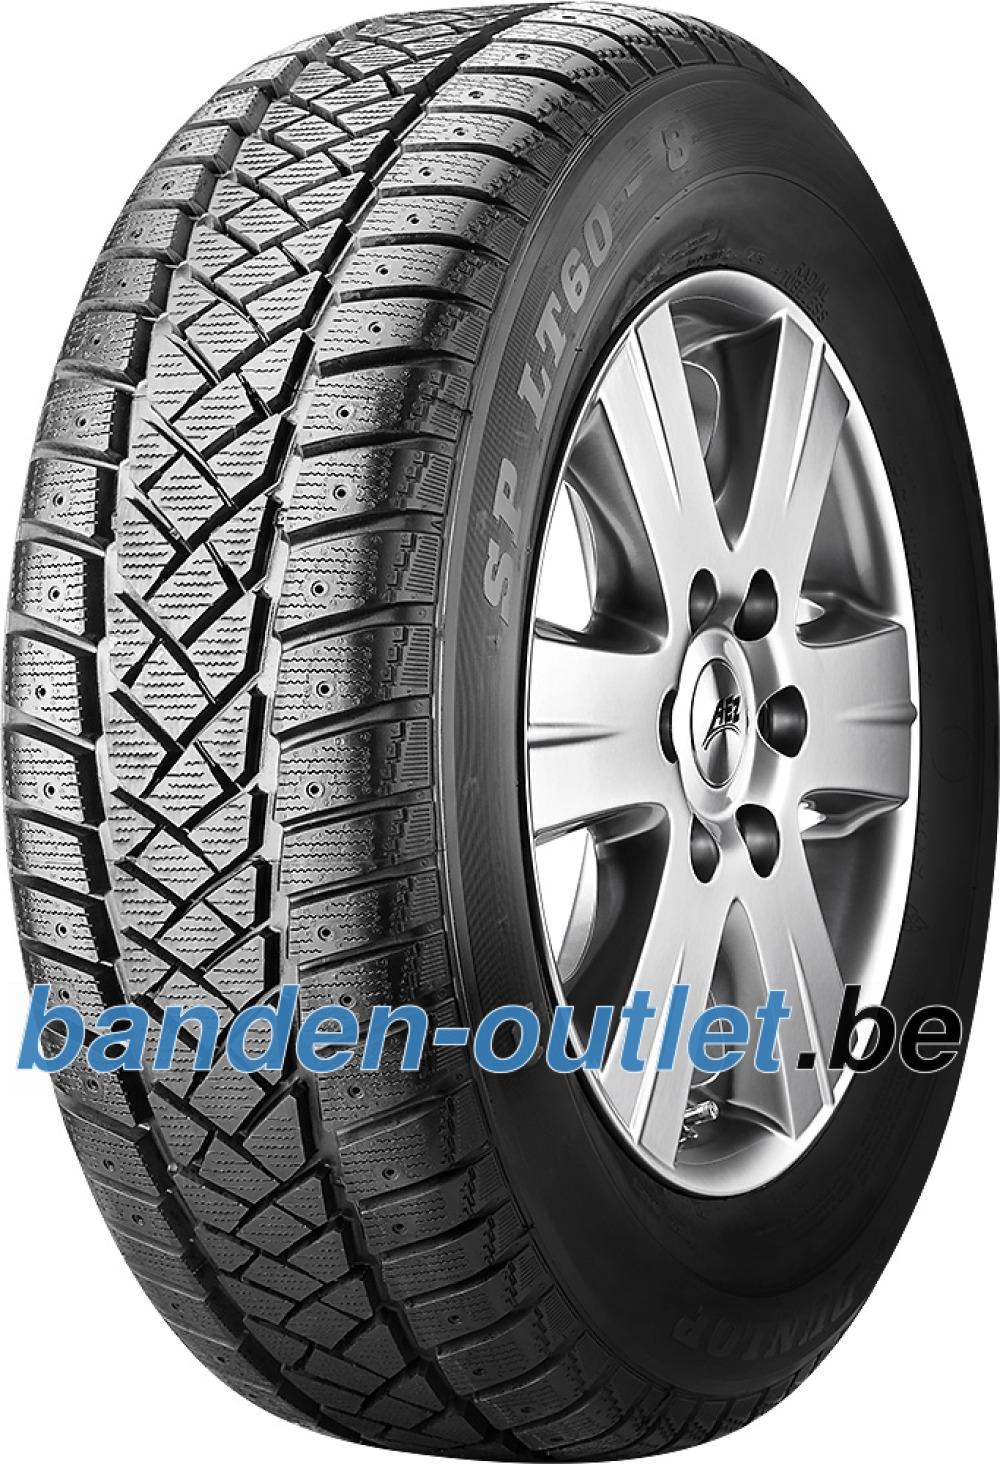 Dunlop SP LT 60 ( 195/65 R16C 104/102R 8PR , Te spiken )